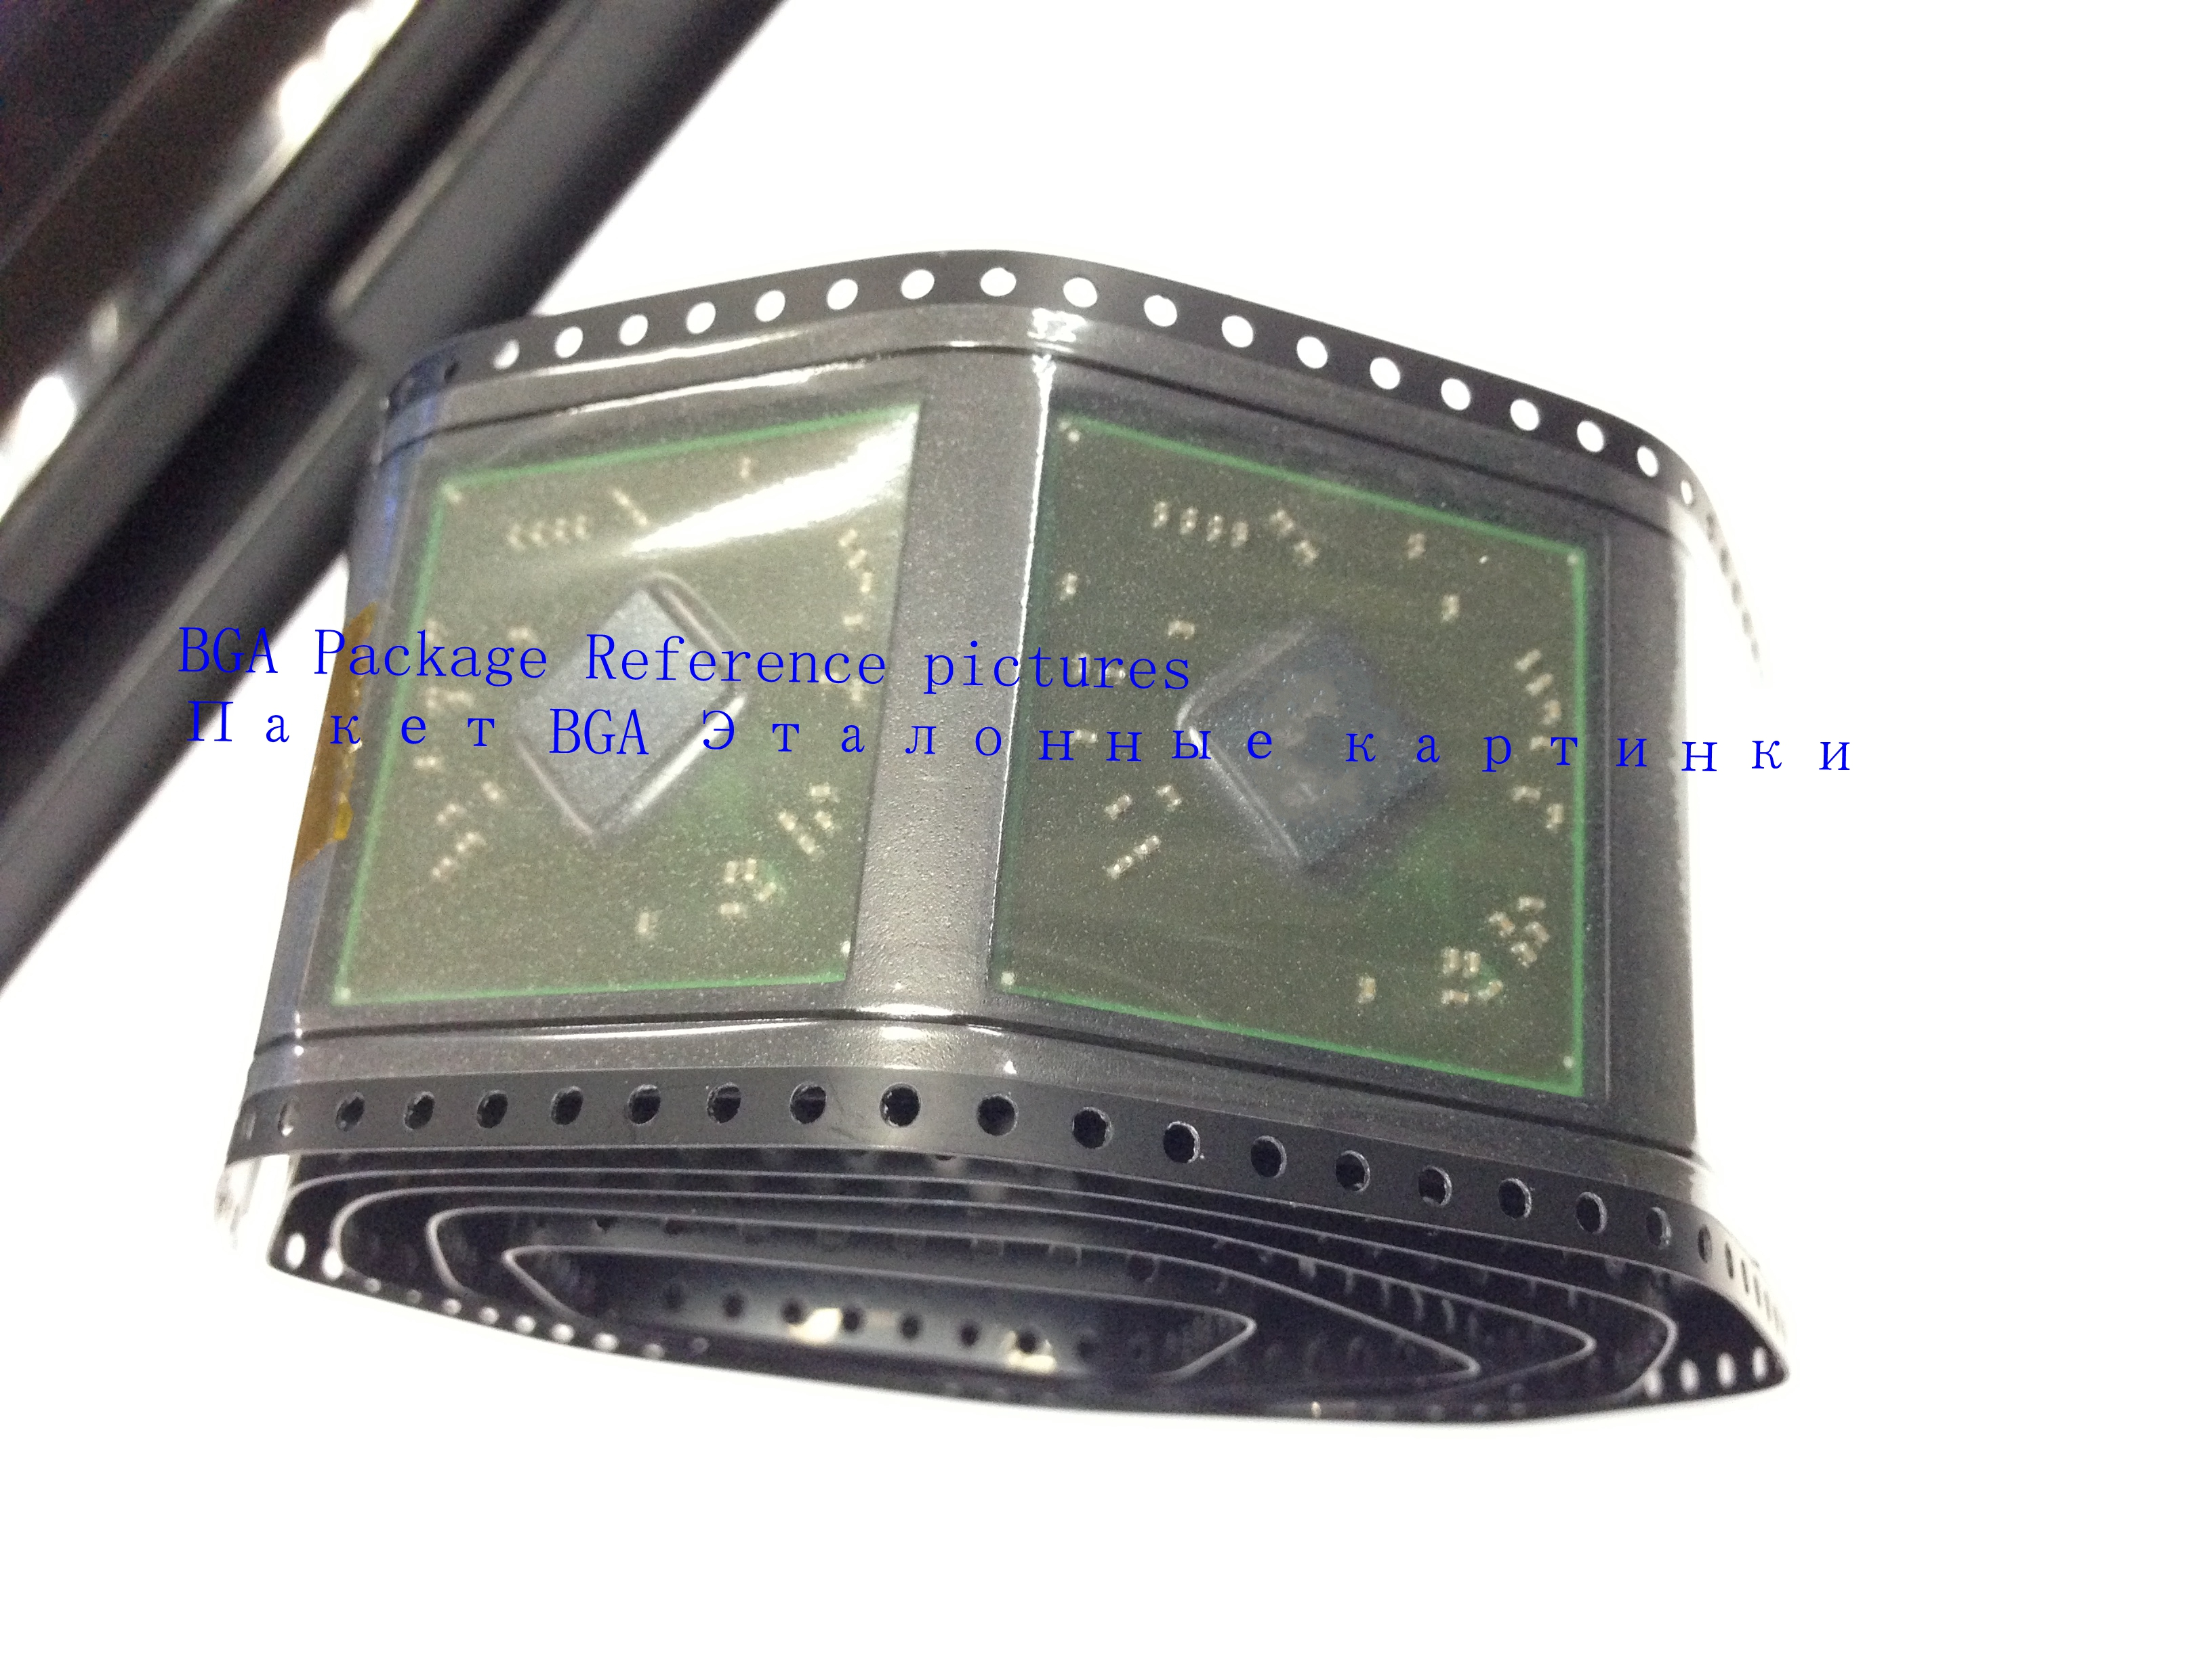 1pcs/lot 100% test very good product N450 SLBMG bga chip reball with balls IC chips1pcs/lot 100% test very good product N450 SLBMG bga chip reball with balls IC chips